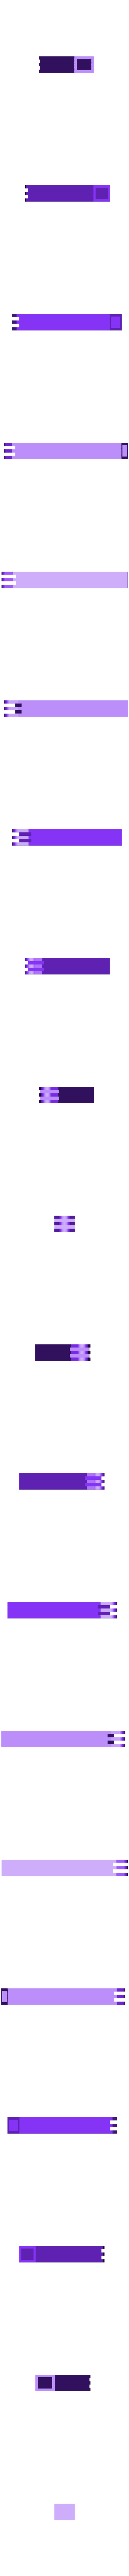 Support_Bar_Bottom.stl Download free STL file Archimedes Screw Bonanza • 3D printer design, Urulysman